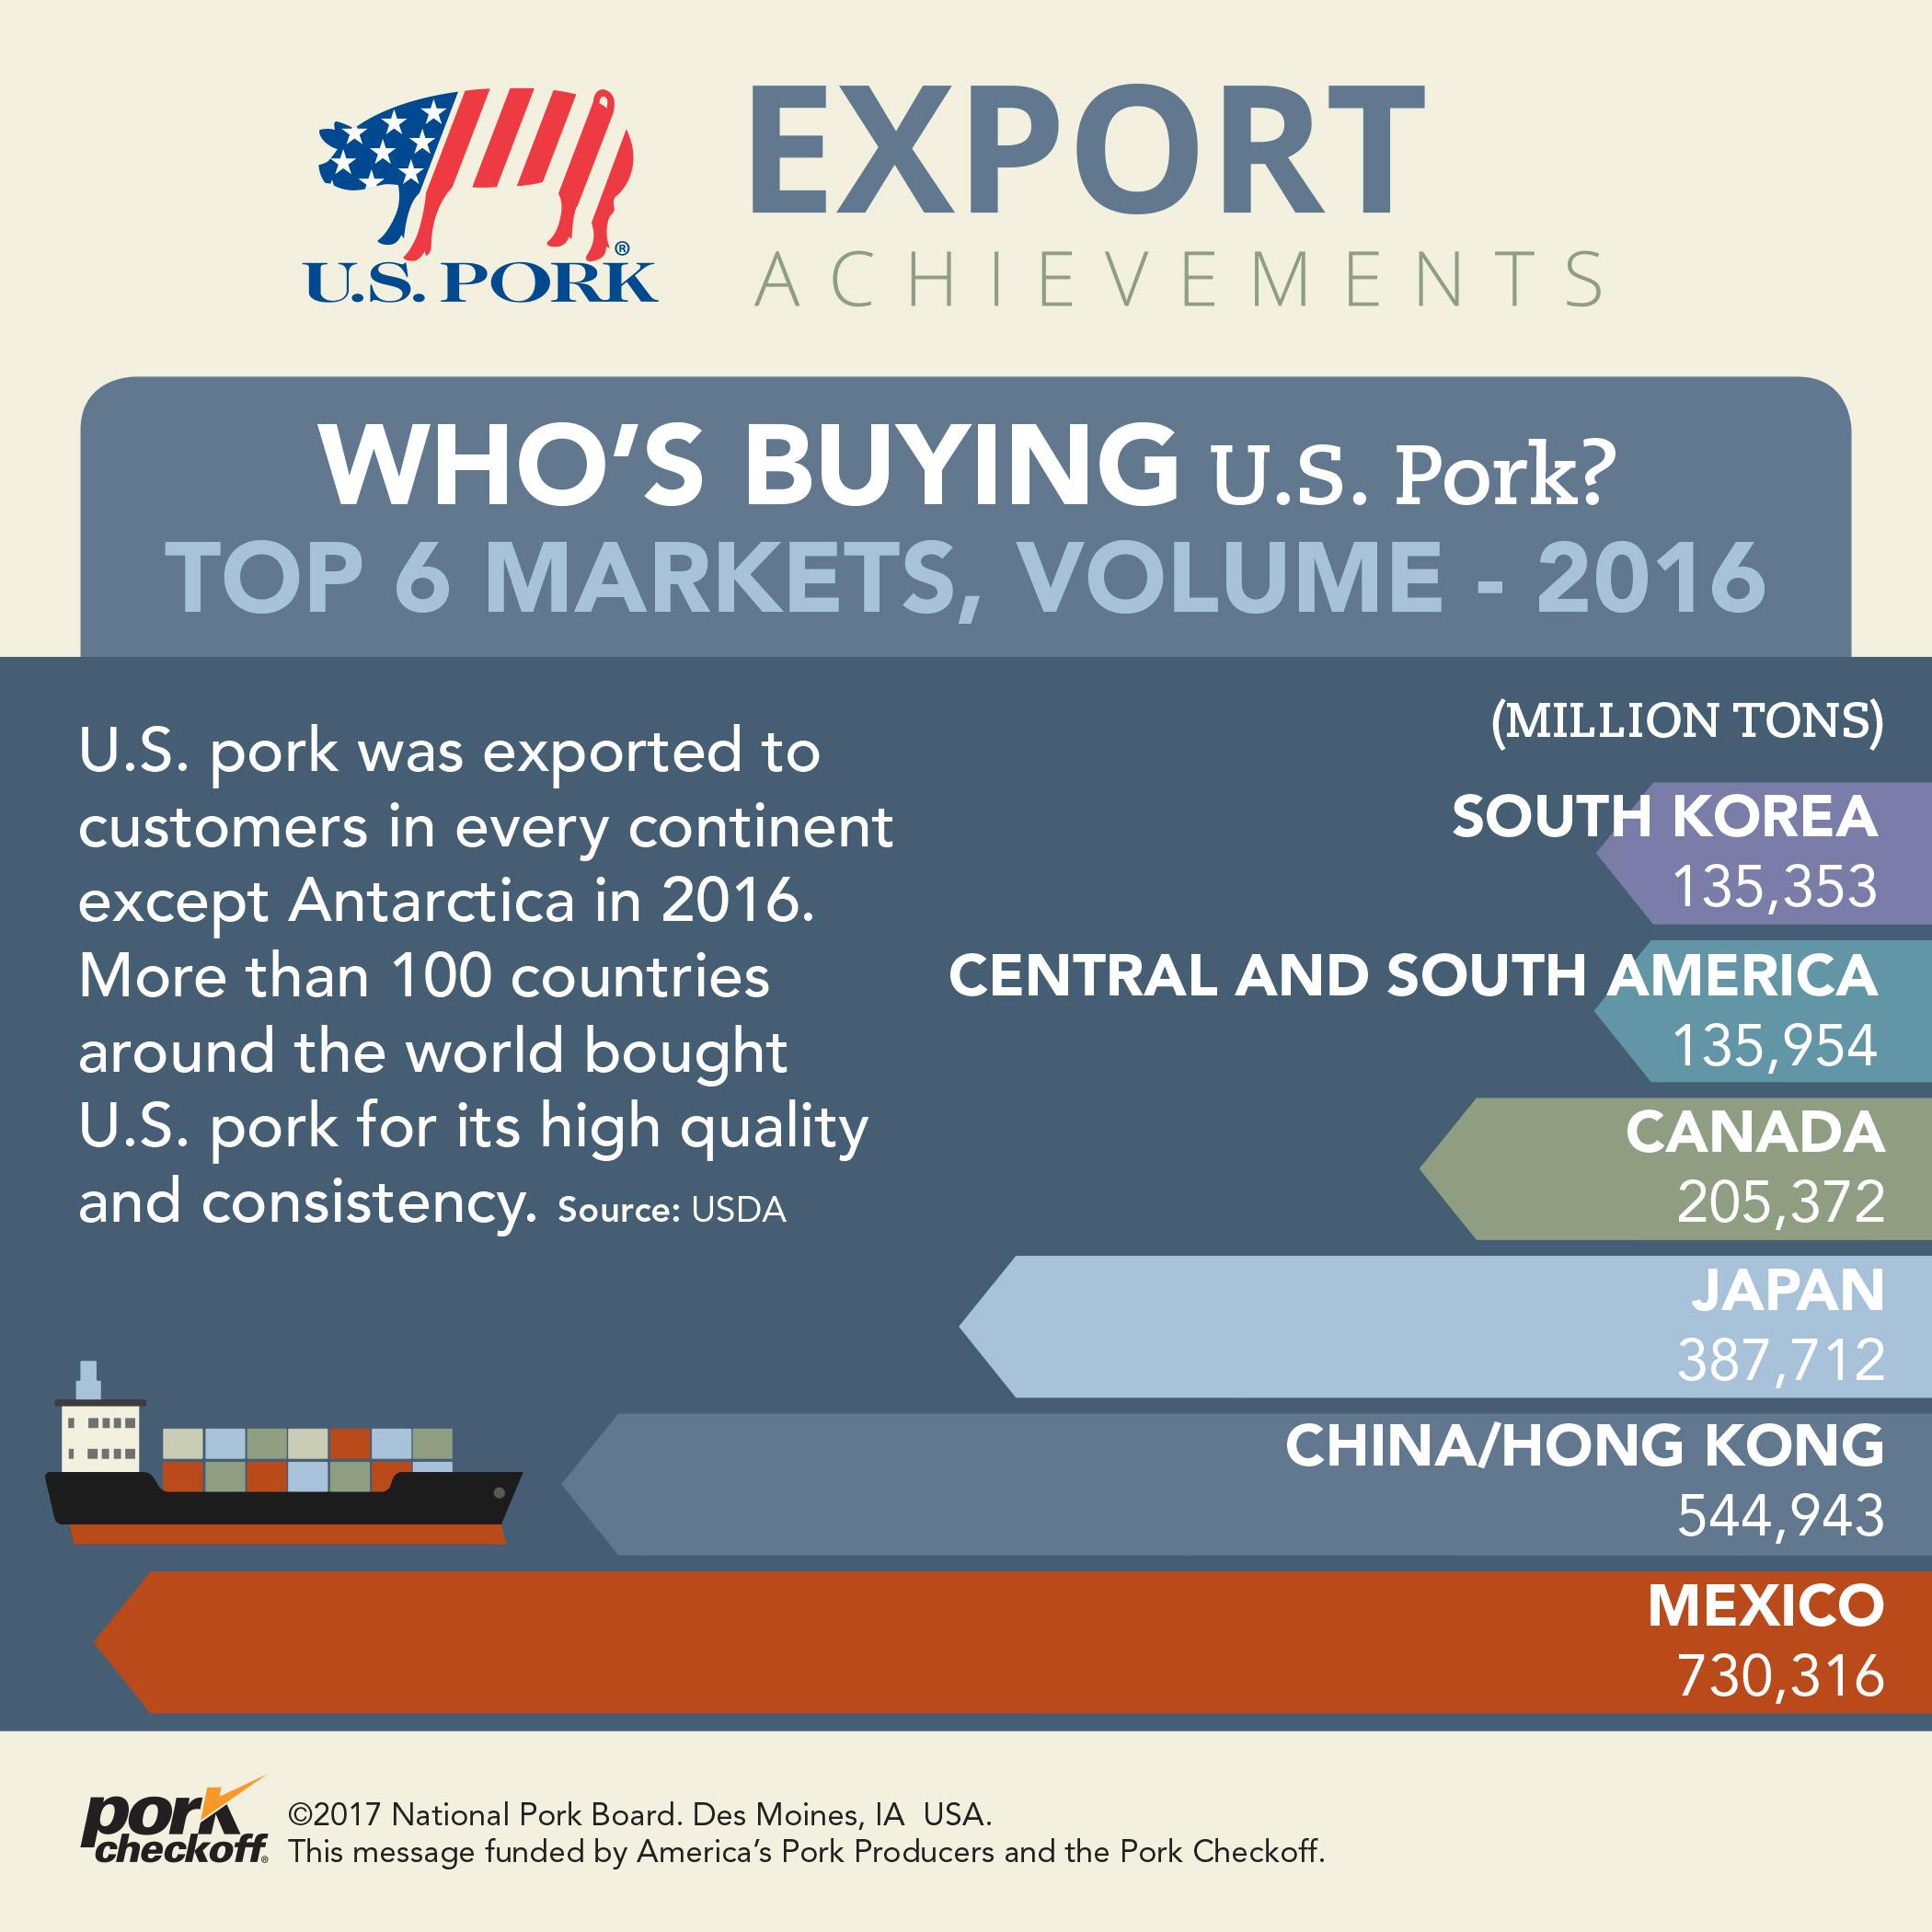 top 6 markets u.s. pork 2016